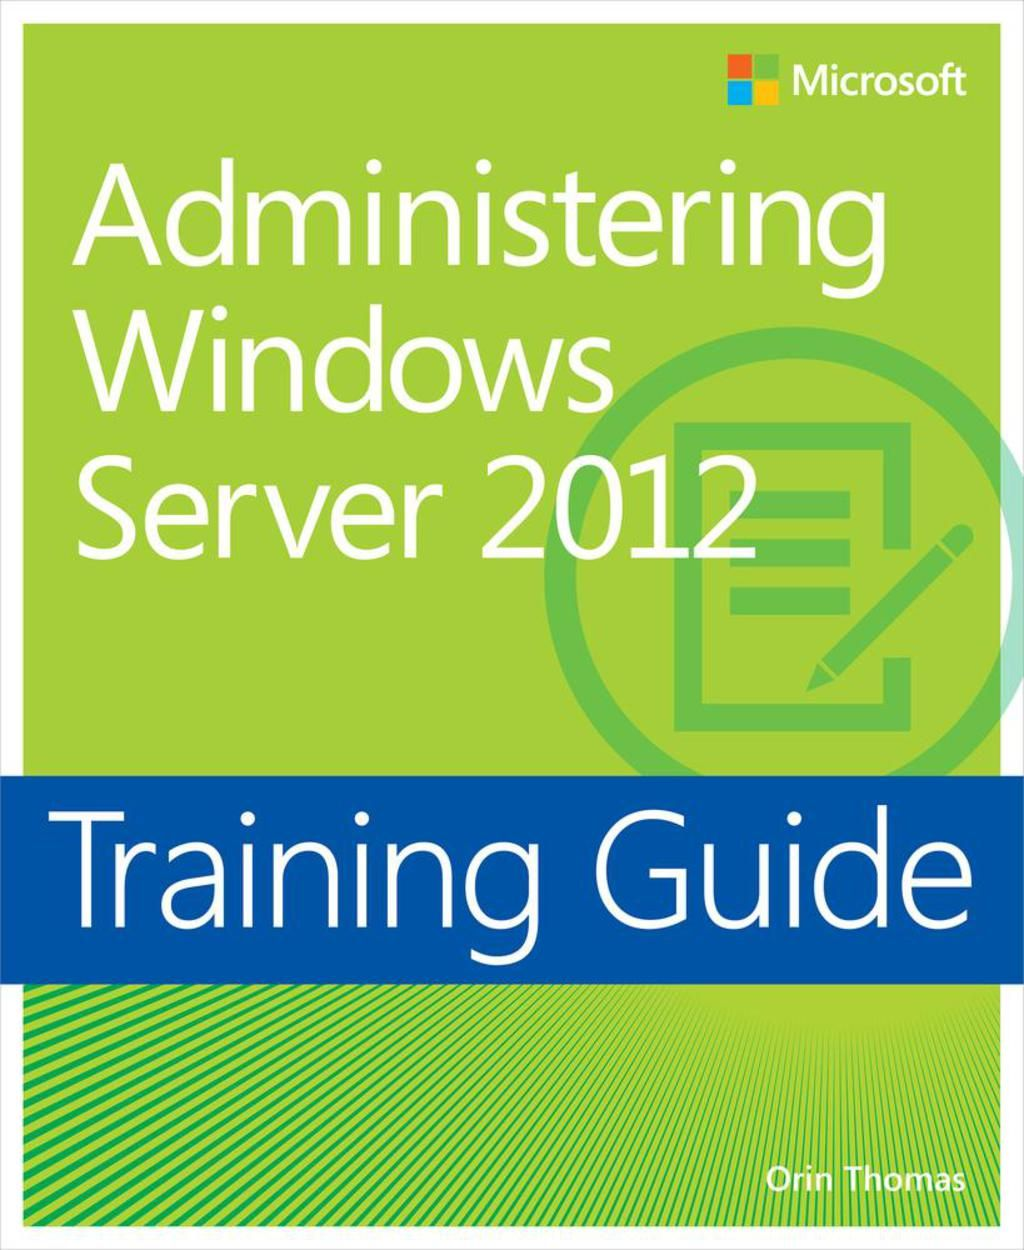 Training Guide Administering Windows Server 2012 (MCSA) (eBook) in